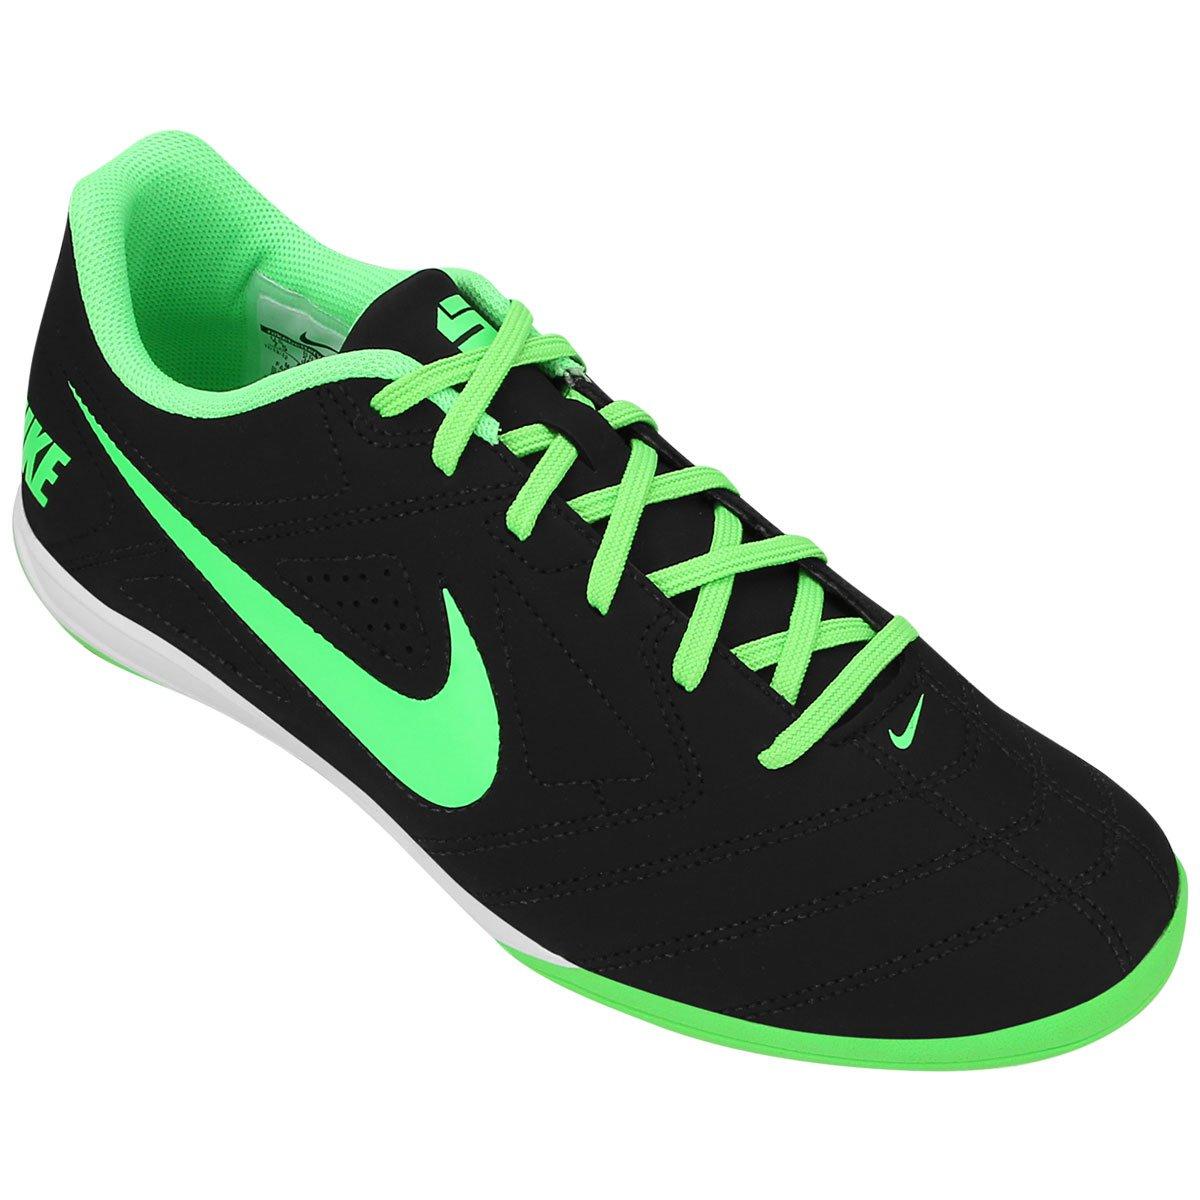 2fdf3444bf Chuteira Nike 5 Beco - Compre Agora